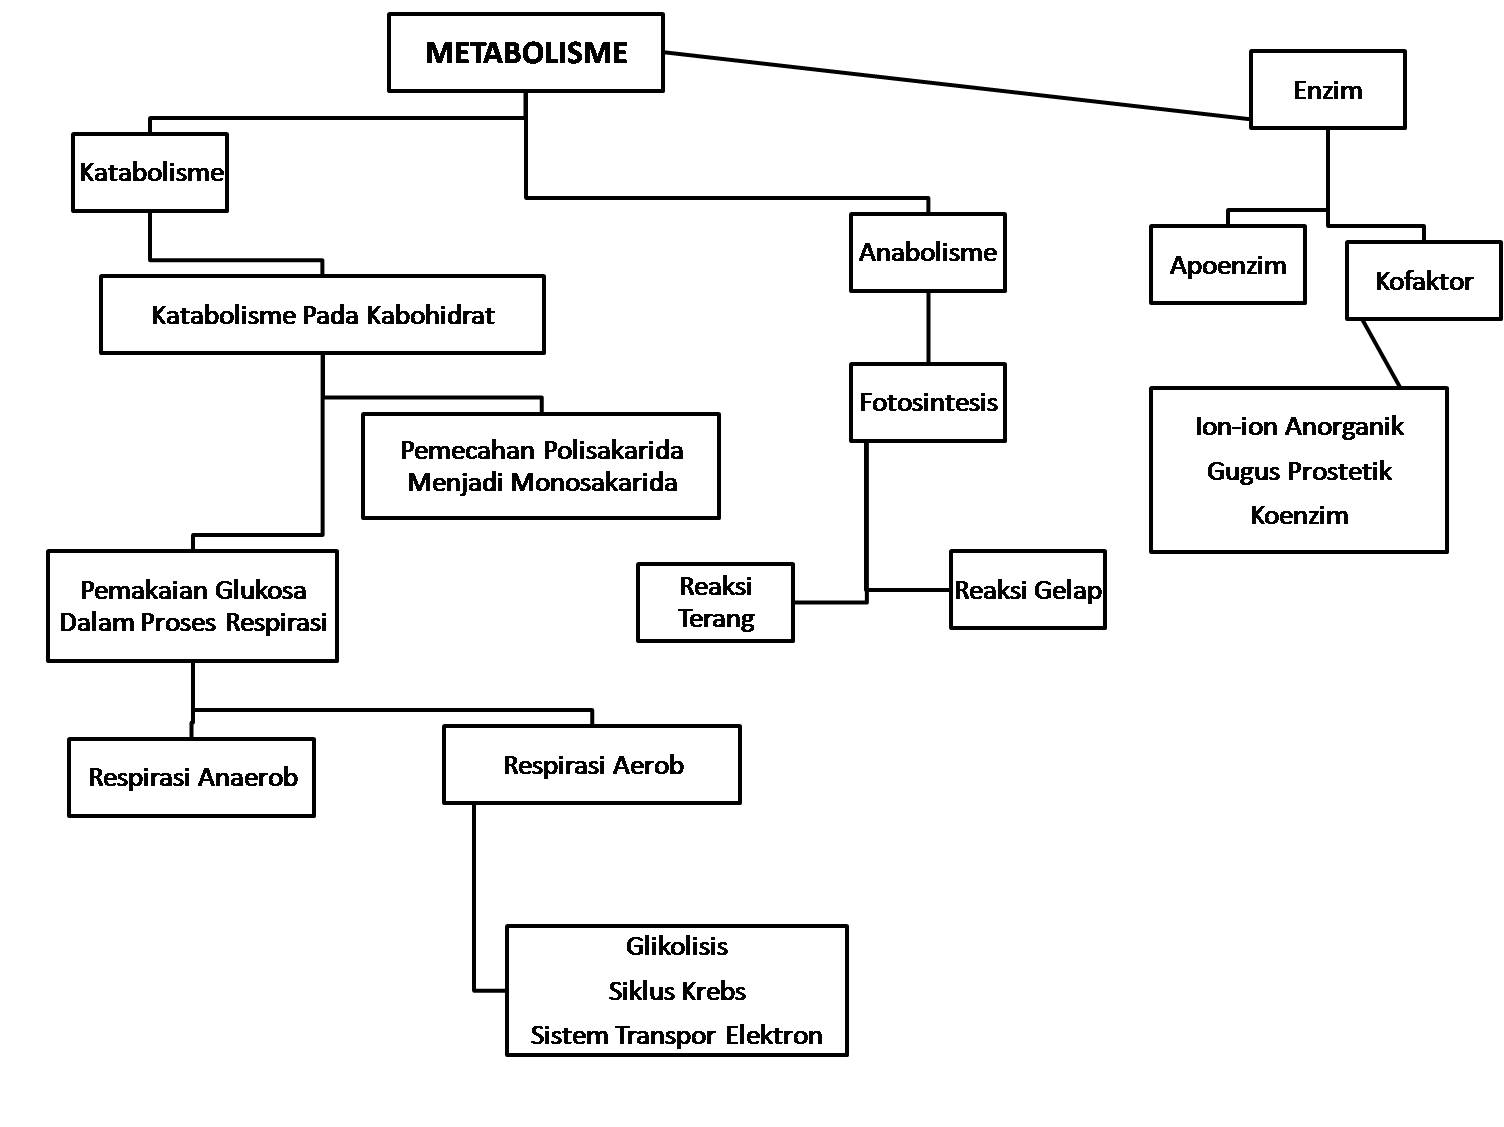 Biokimia Metabolisme Protein Dan Asam Amino